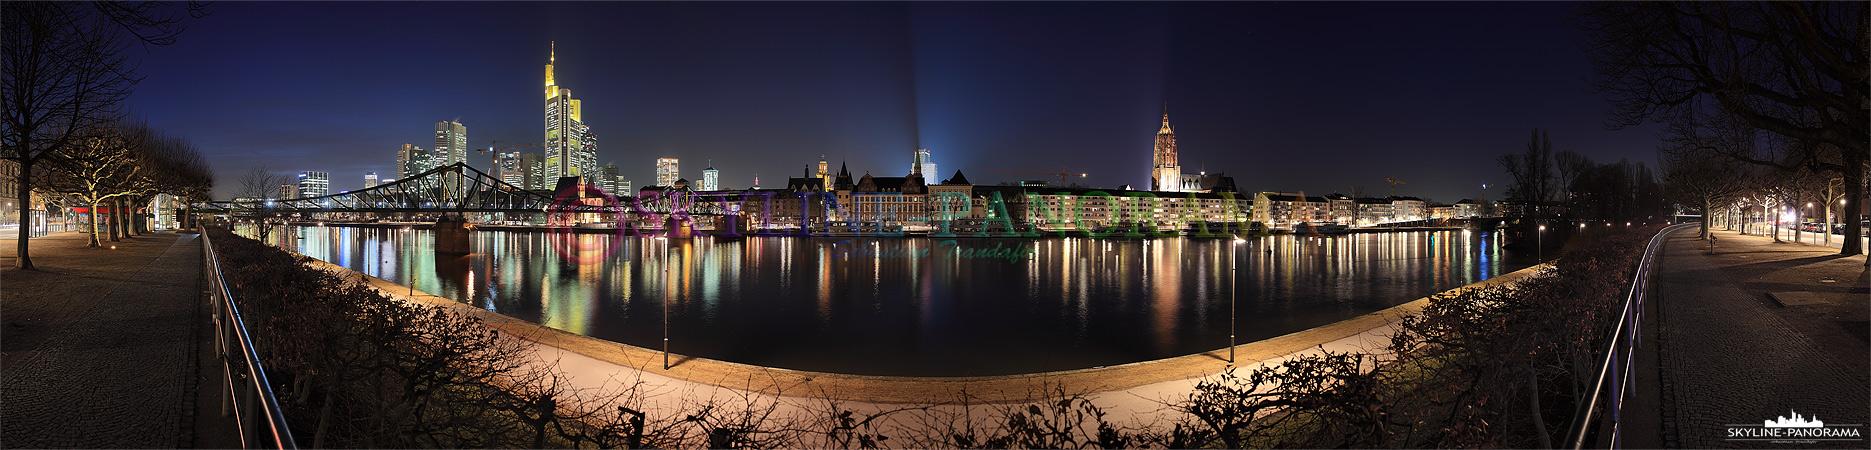 Frankfurt Nacht